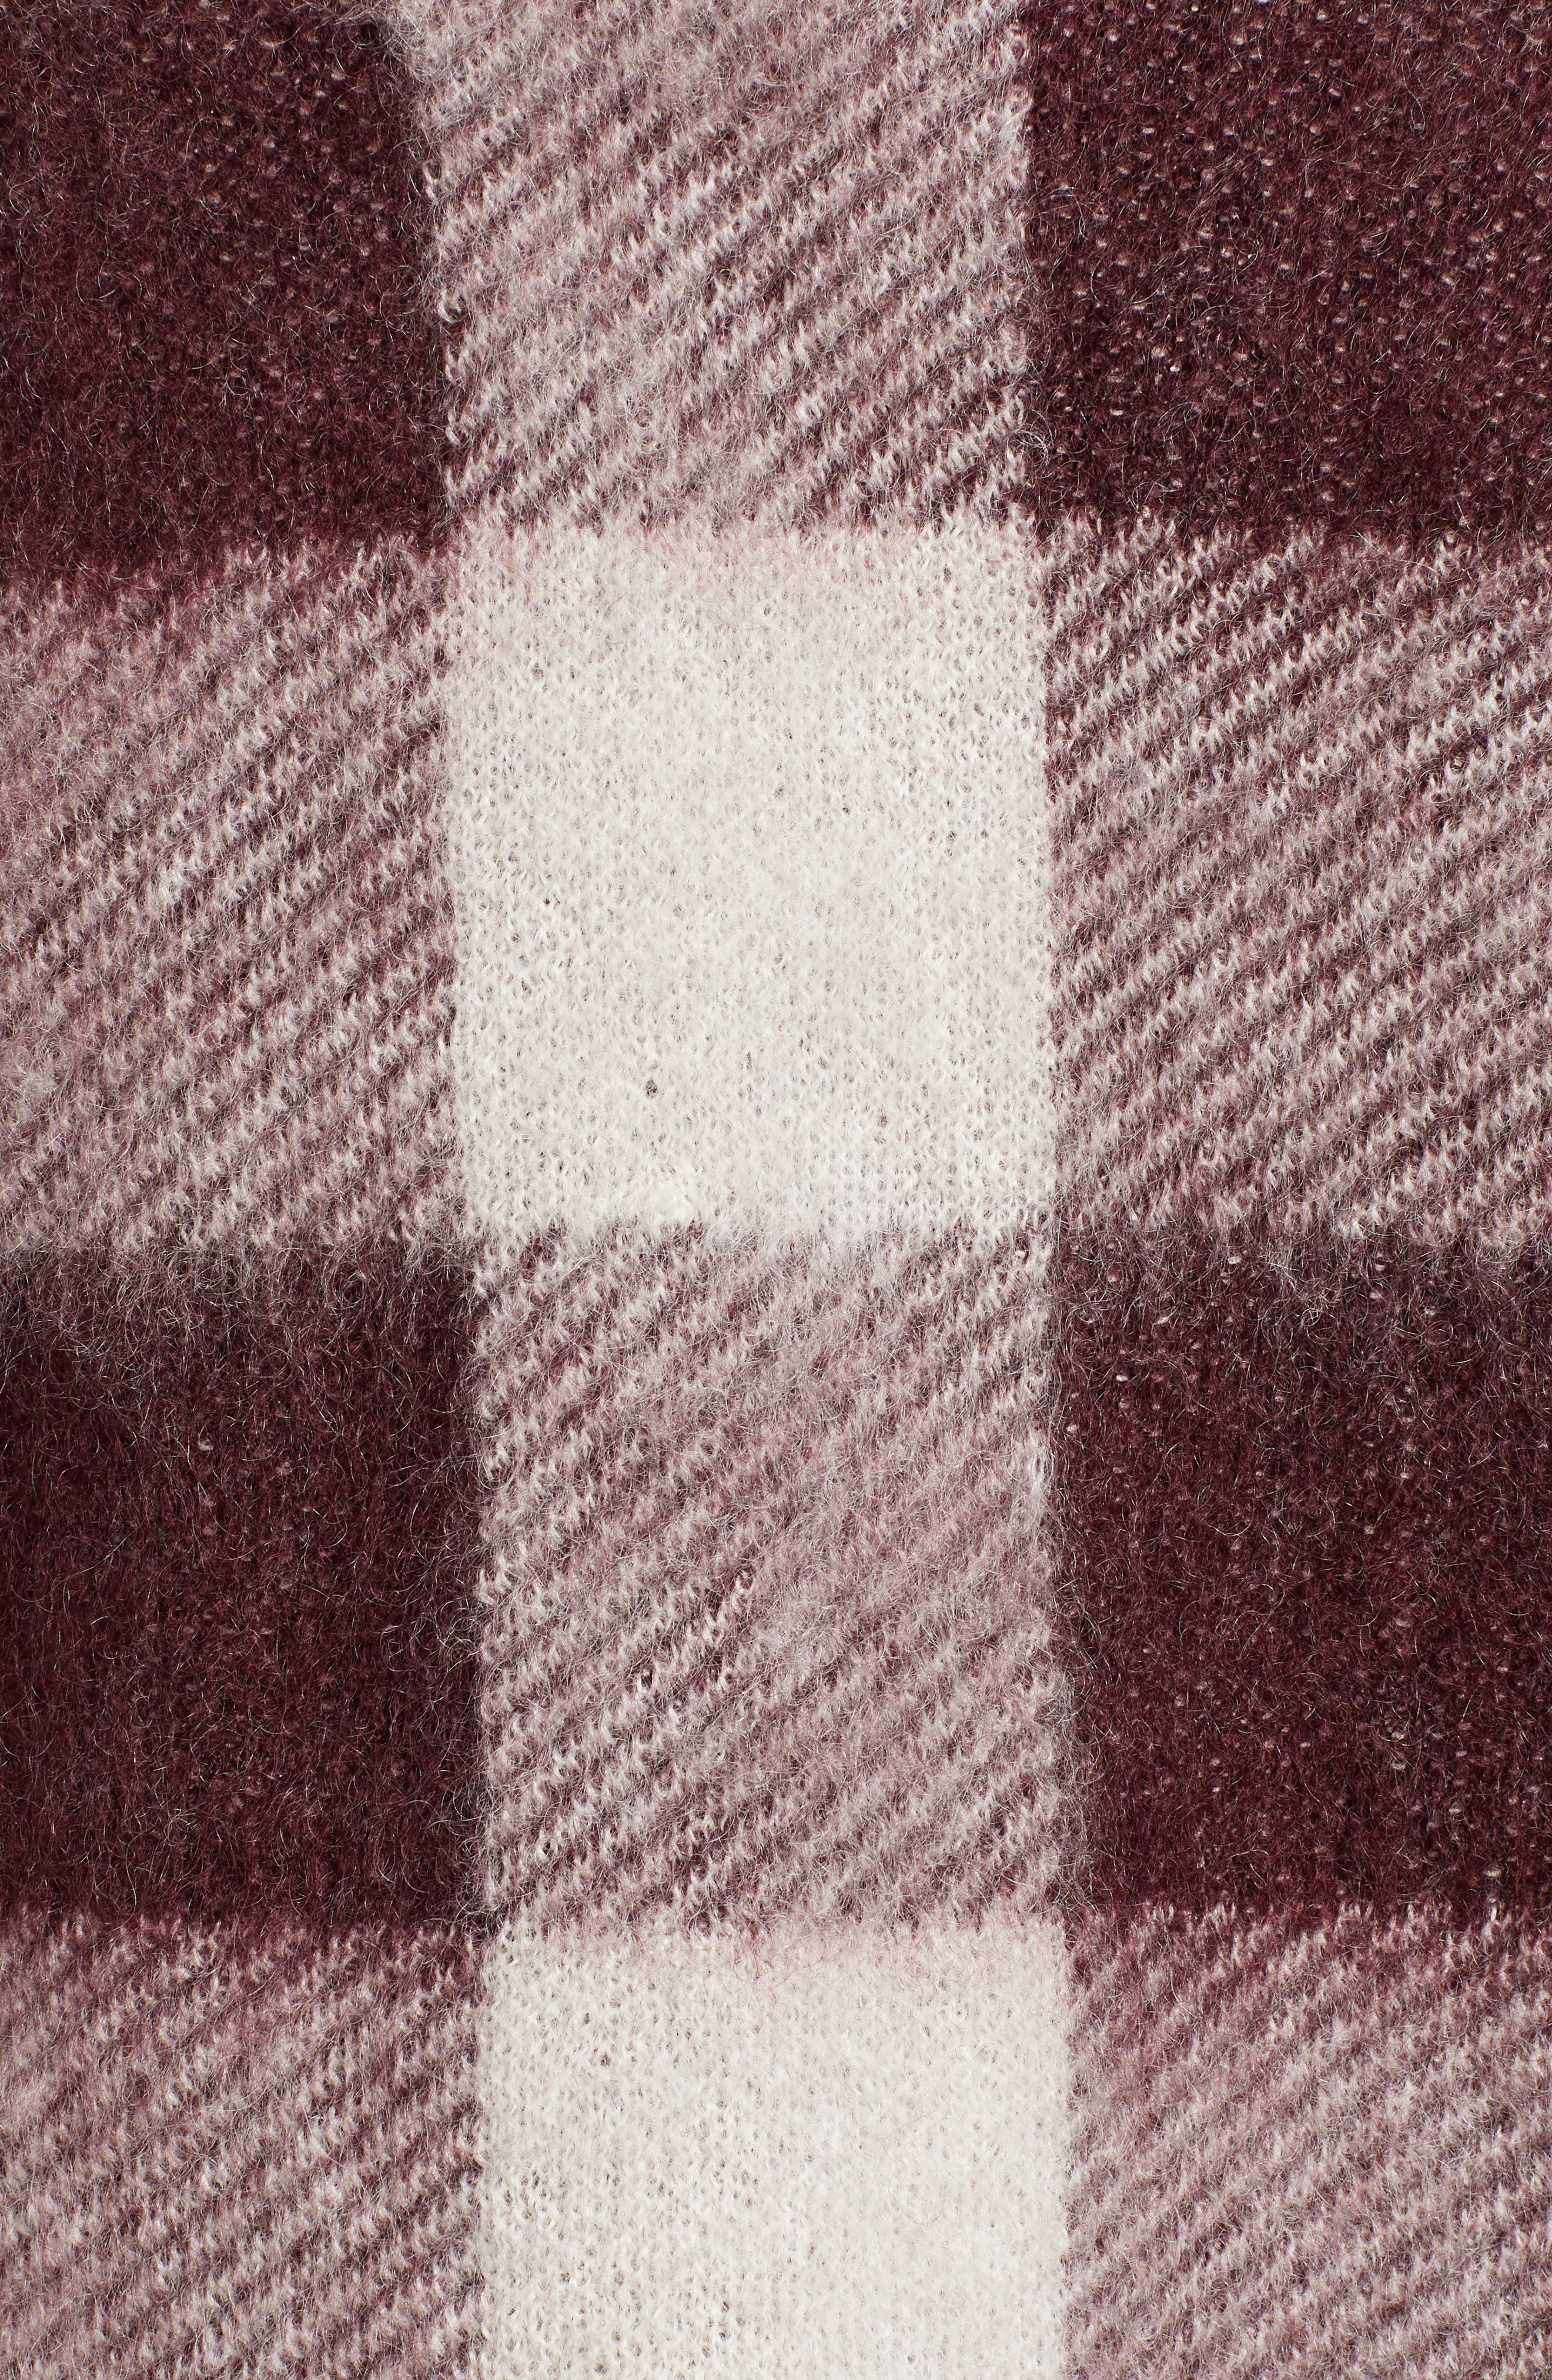 Low Mohair Blend V-Neck Sweater,                             Alternate thumbnail 5, color,                             PLUM CHECK